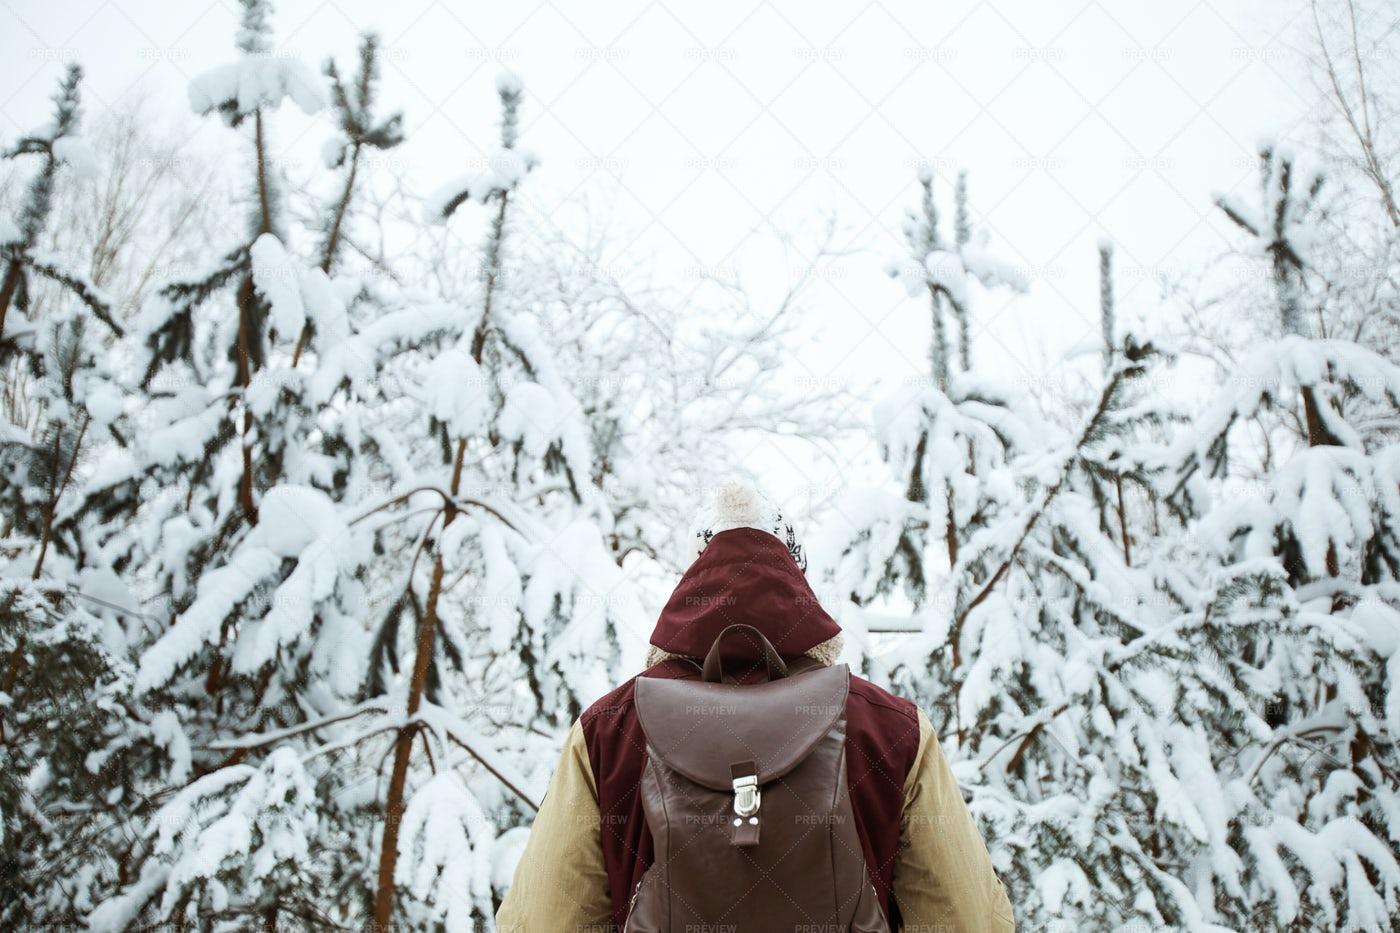 Winter Adventure: Stock Photos